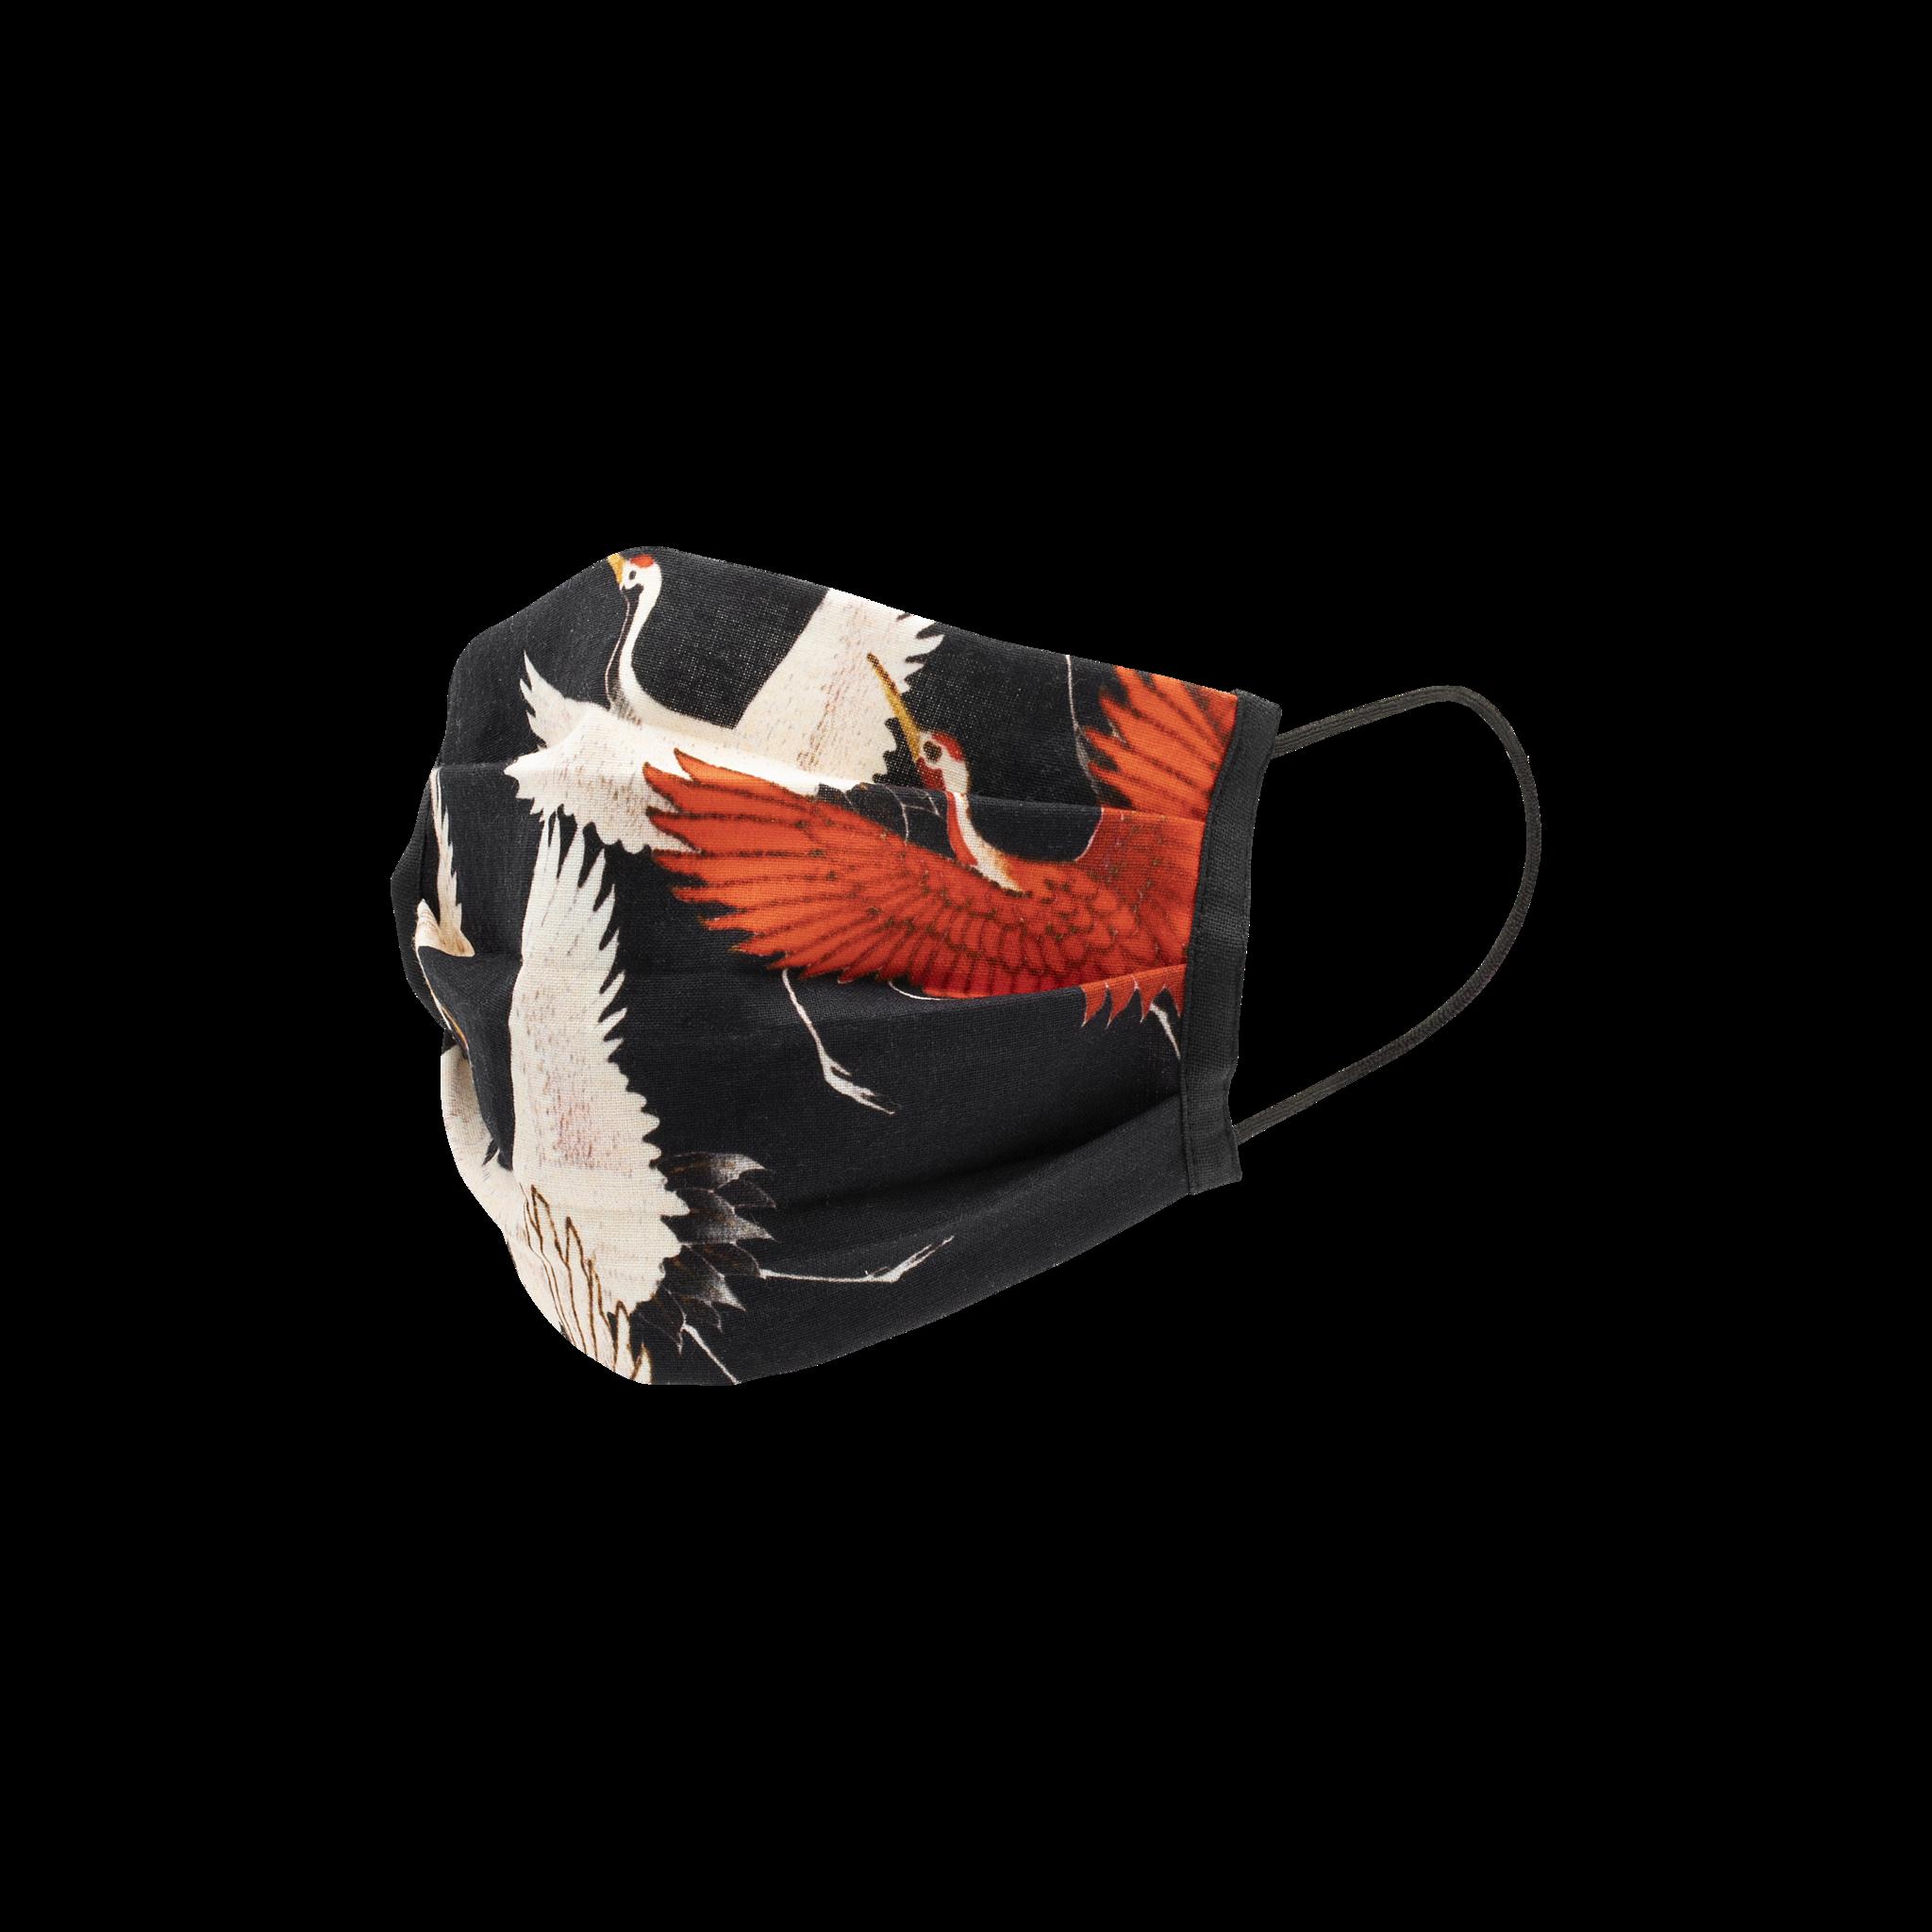 Kraanvogels mondkapje set van 2 - Duurzaam, Wasbaar, Herbruikbaar - 2-laags Katoen - Ademend - Print-1